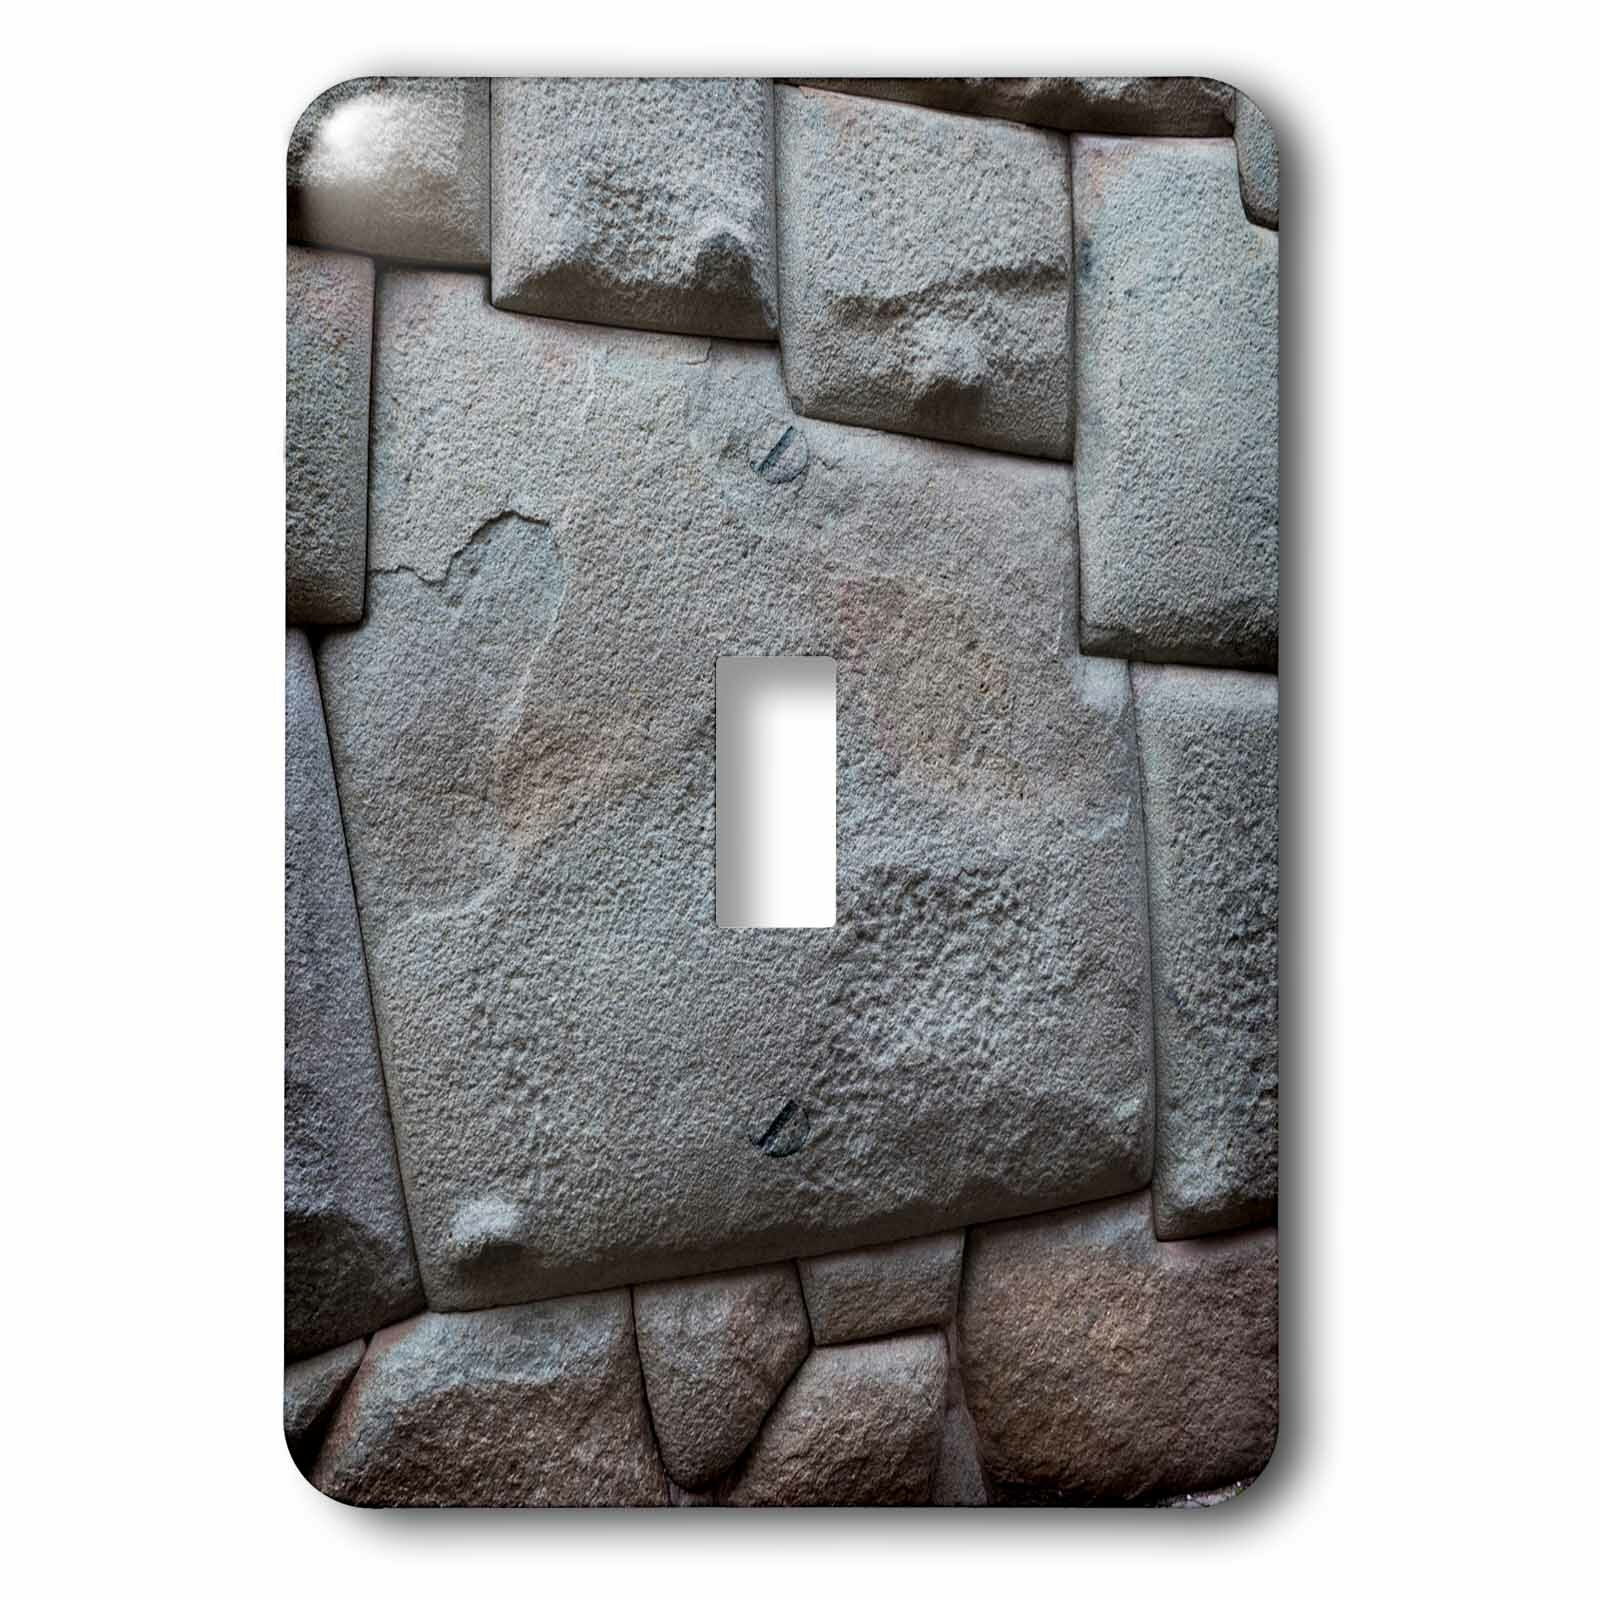 3drose Inca Stonework 1 Gang Toggle Light Switch Wall Plate Wayfair